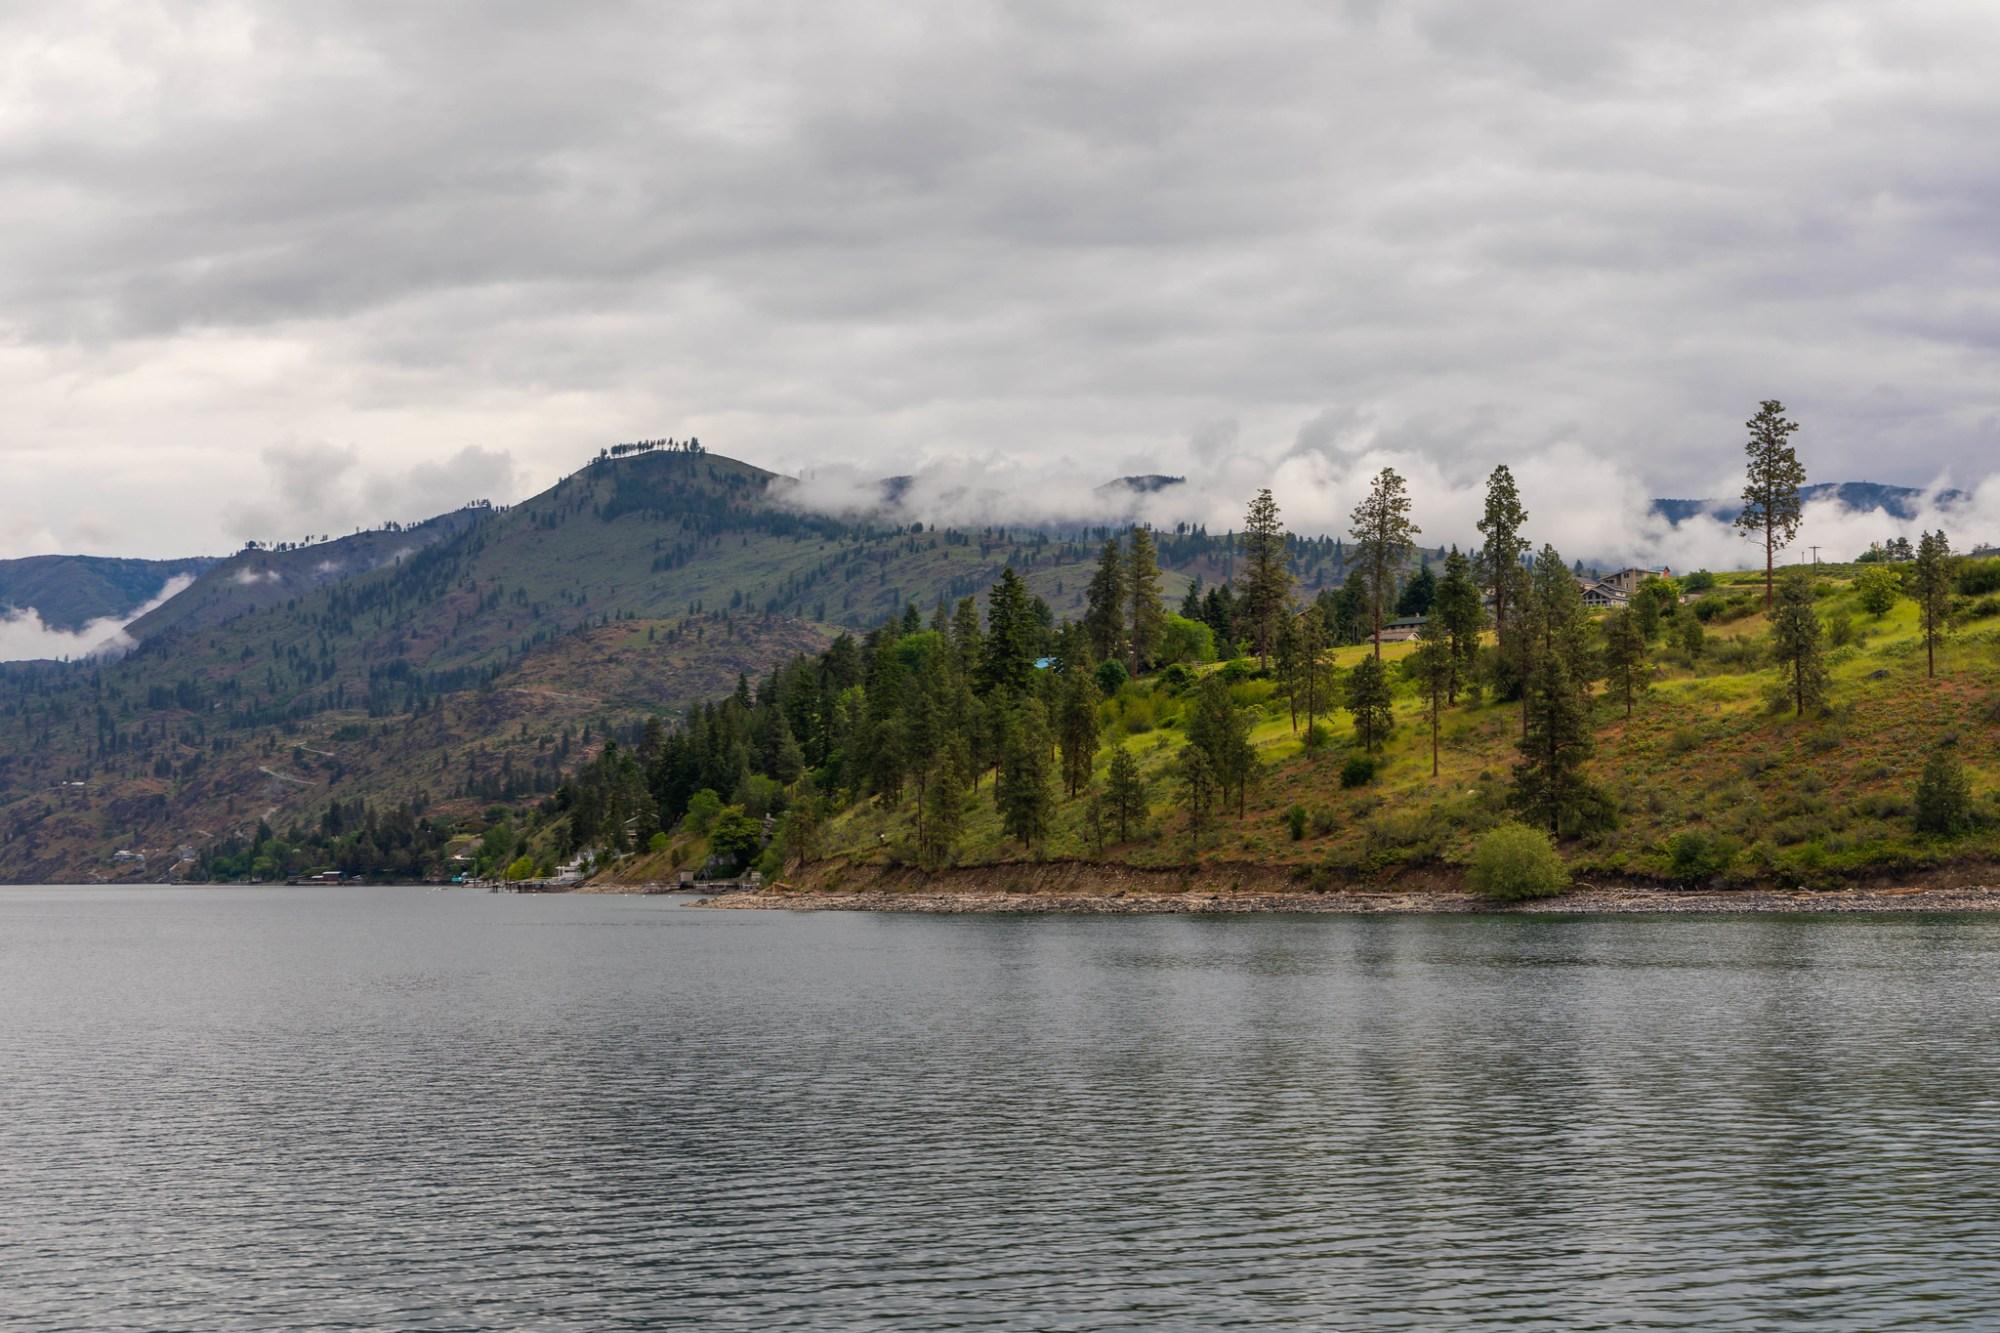 05.24. Chelan Lake